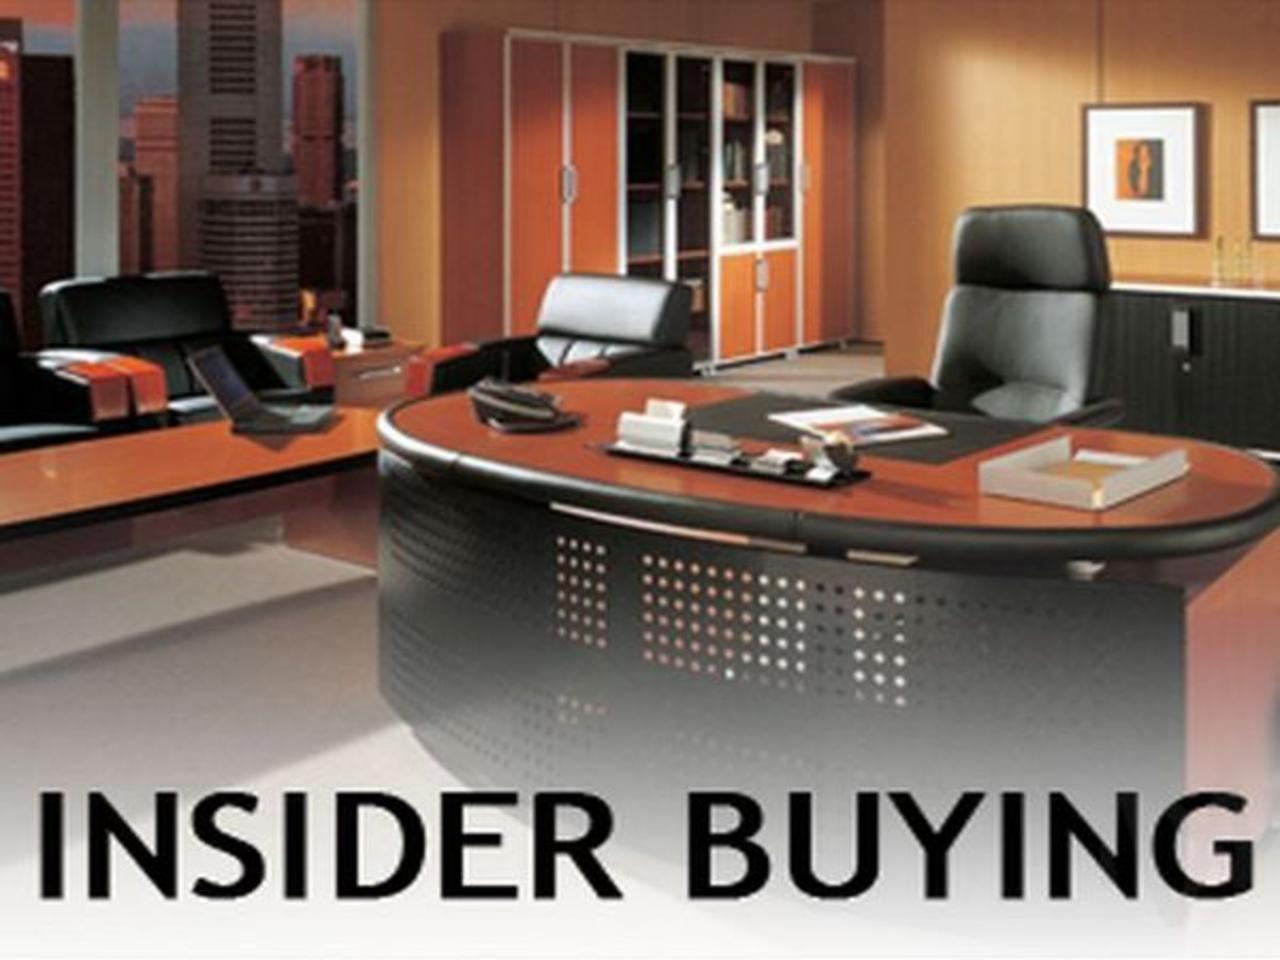 Monday 9/13 Insider Buying Report: TEN, RILY